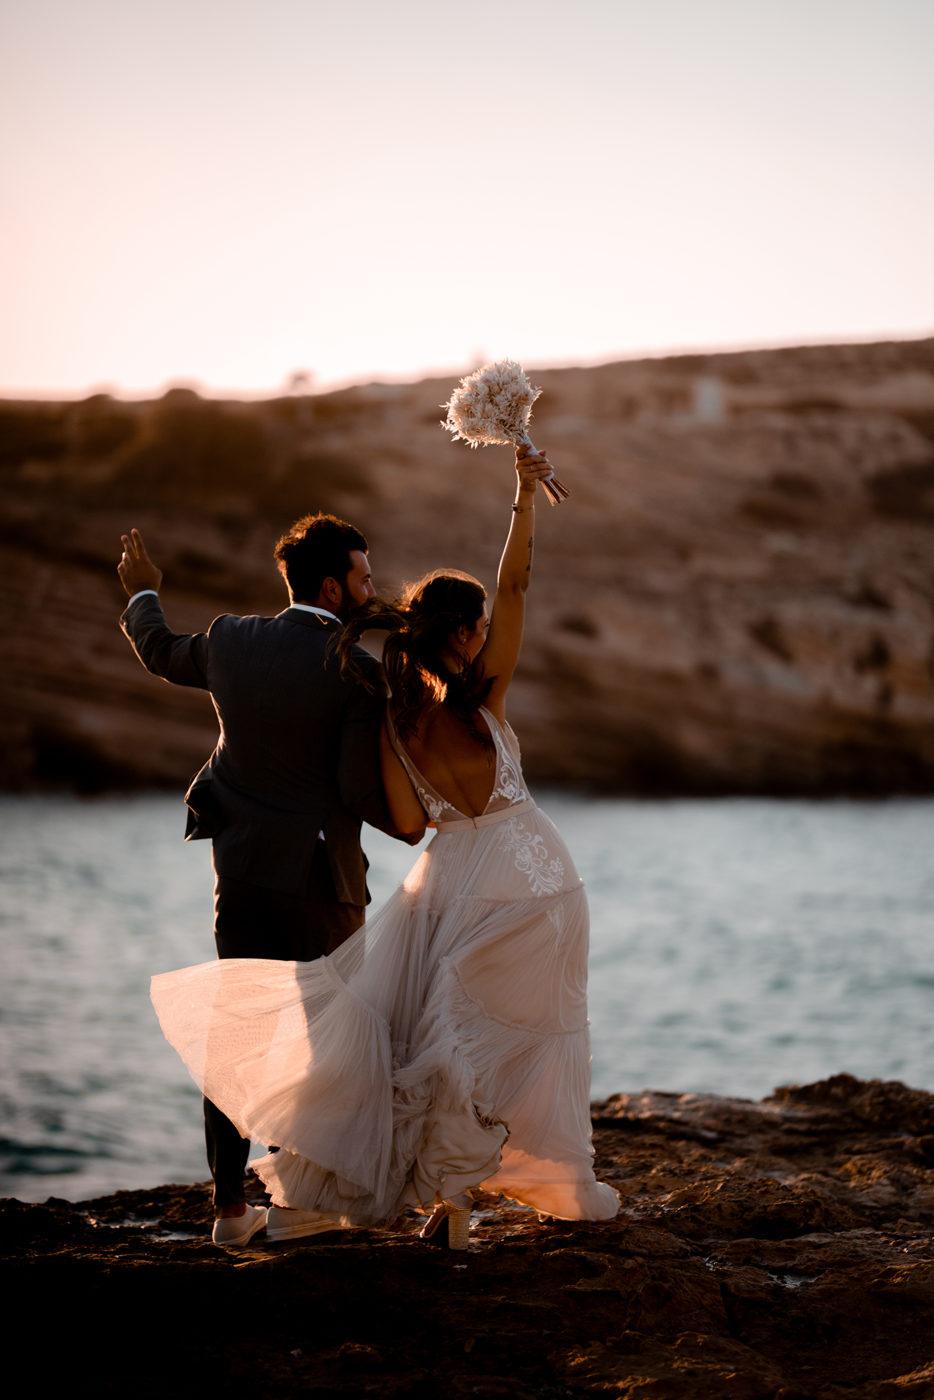 kirill-samarits-wedding-photography-koufonisia-greece-couple-photographer (12)